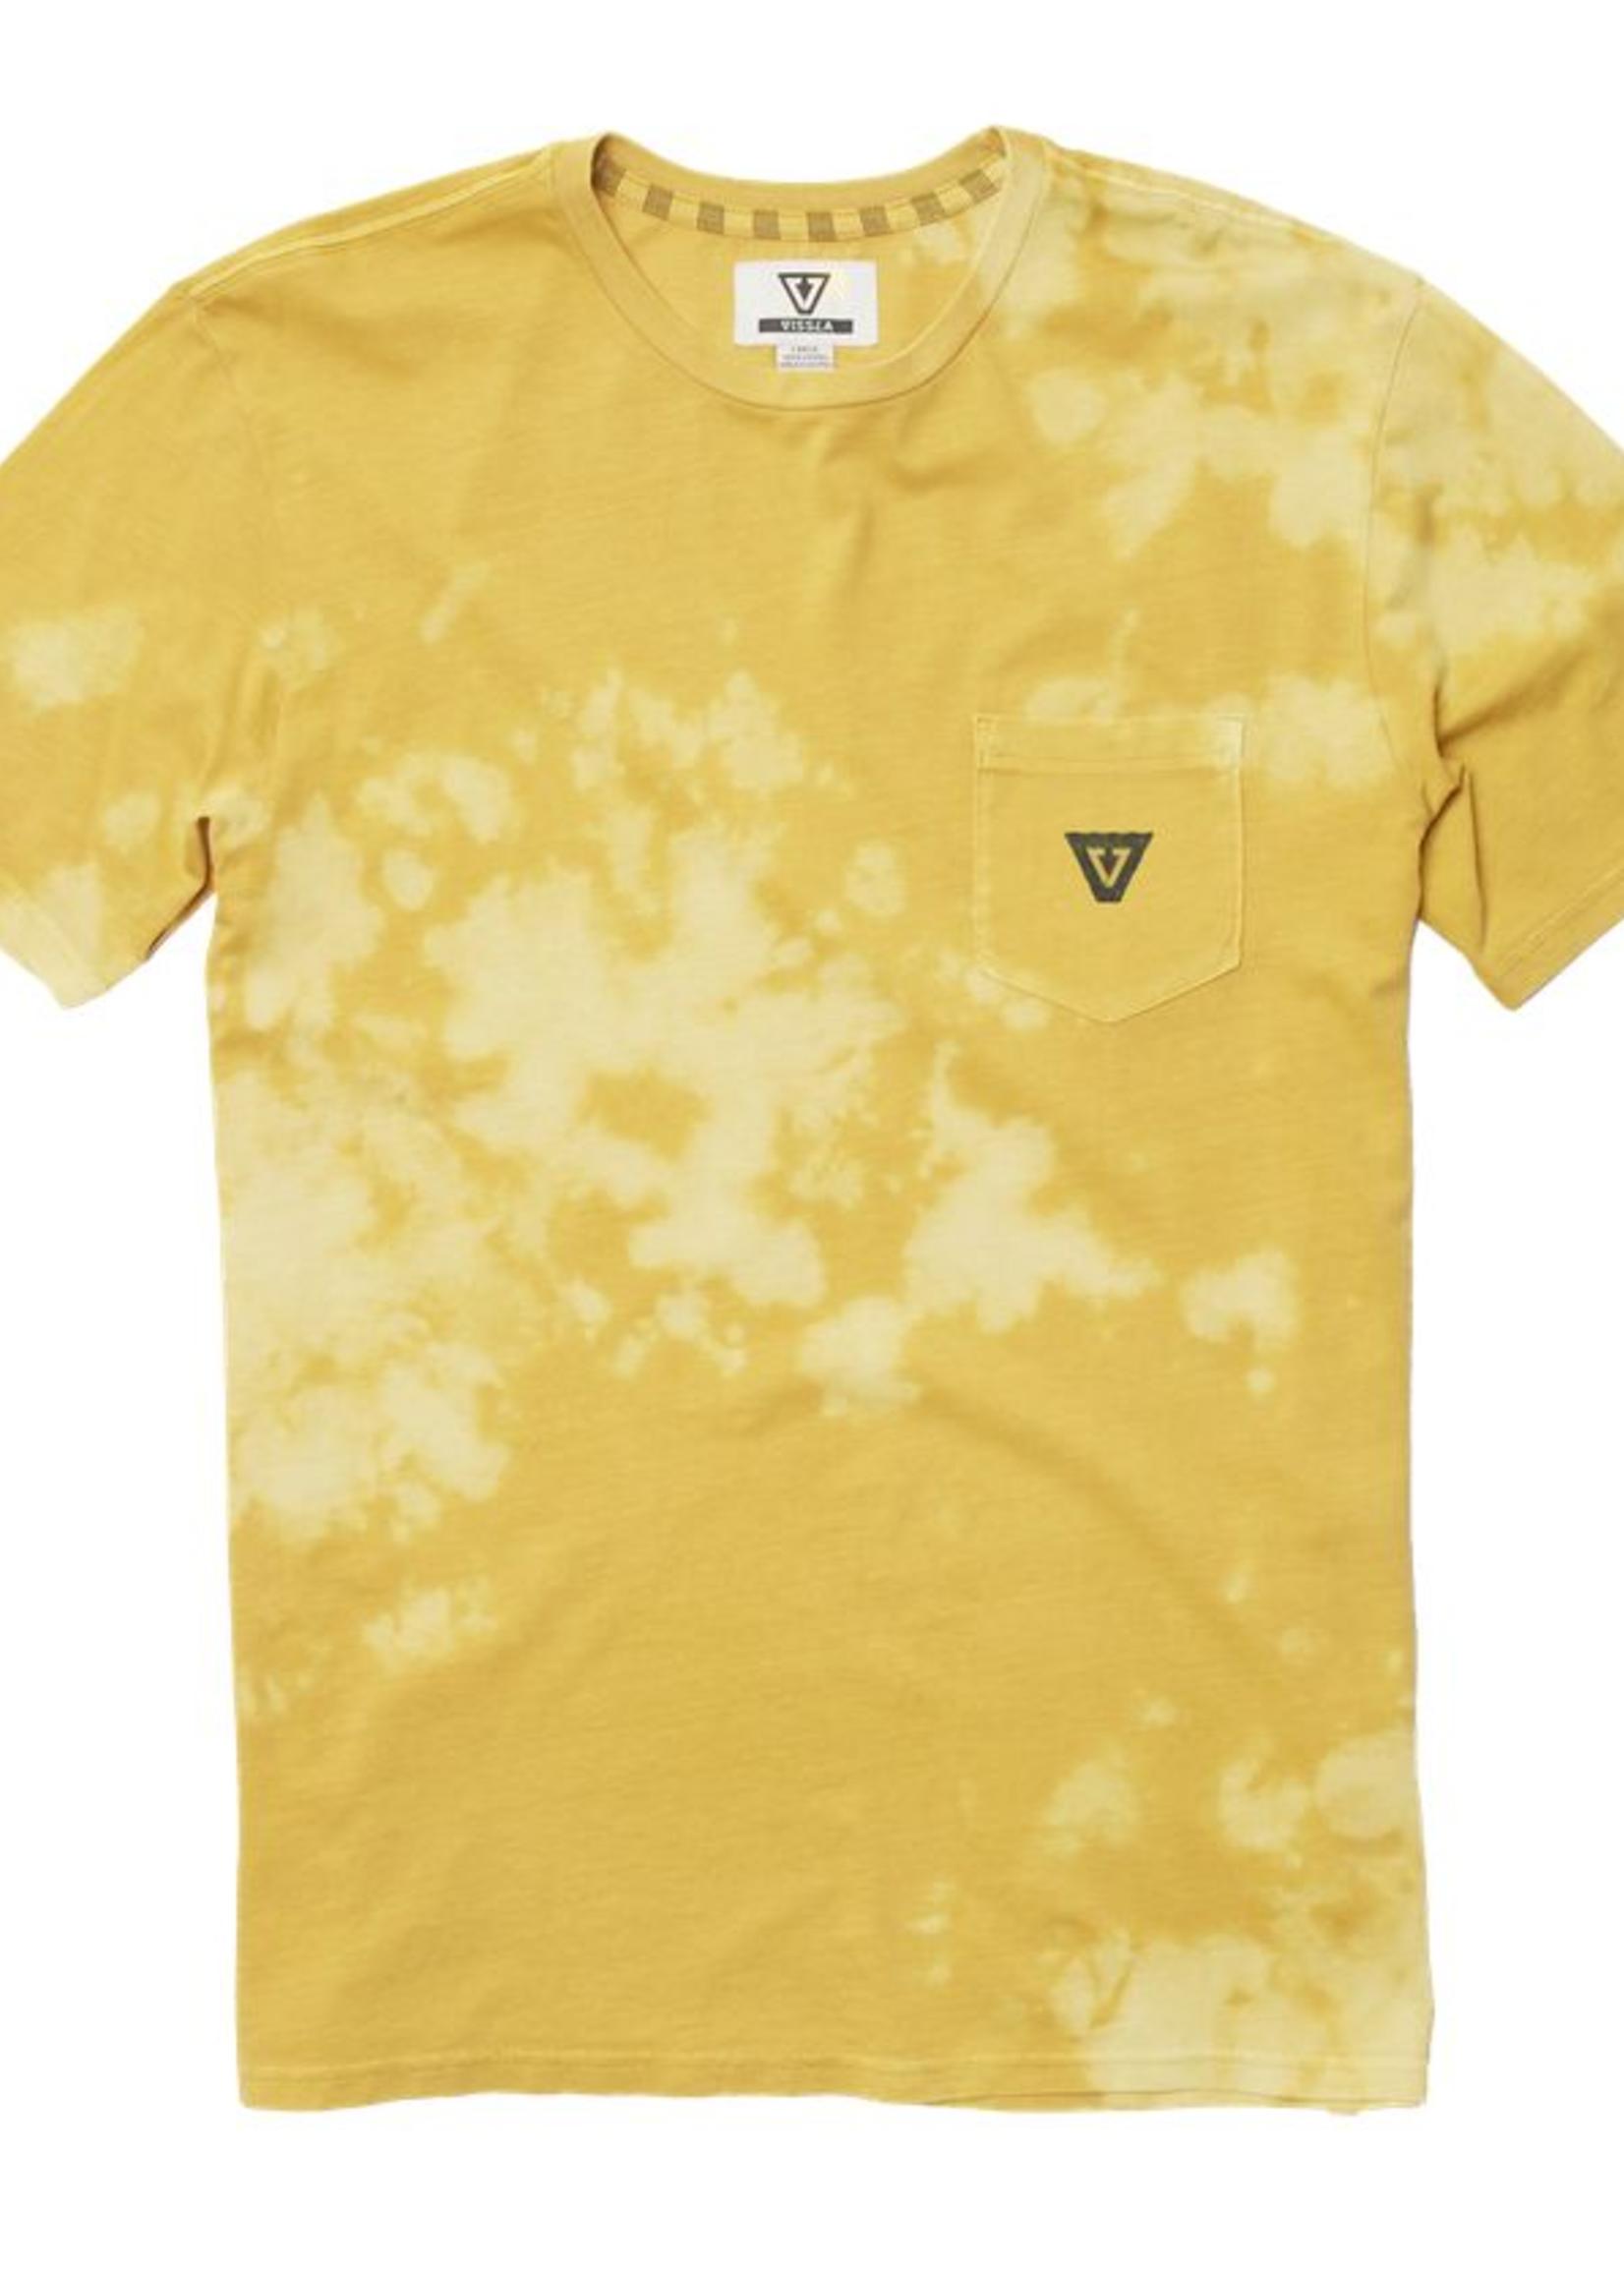 Vissla Capsized Bleach Wash Tee - Yellow